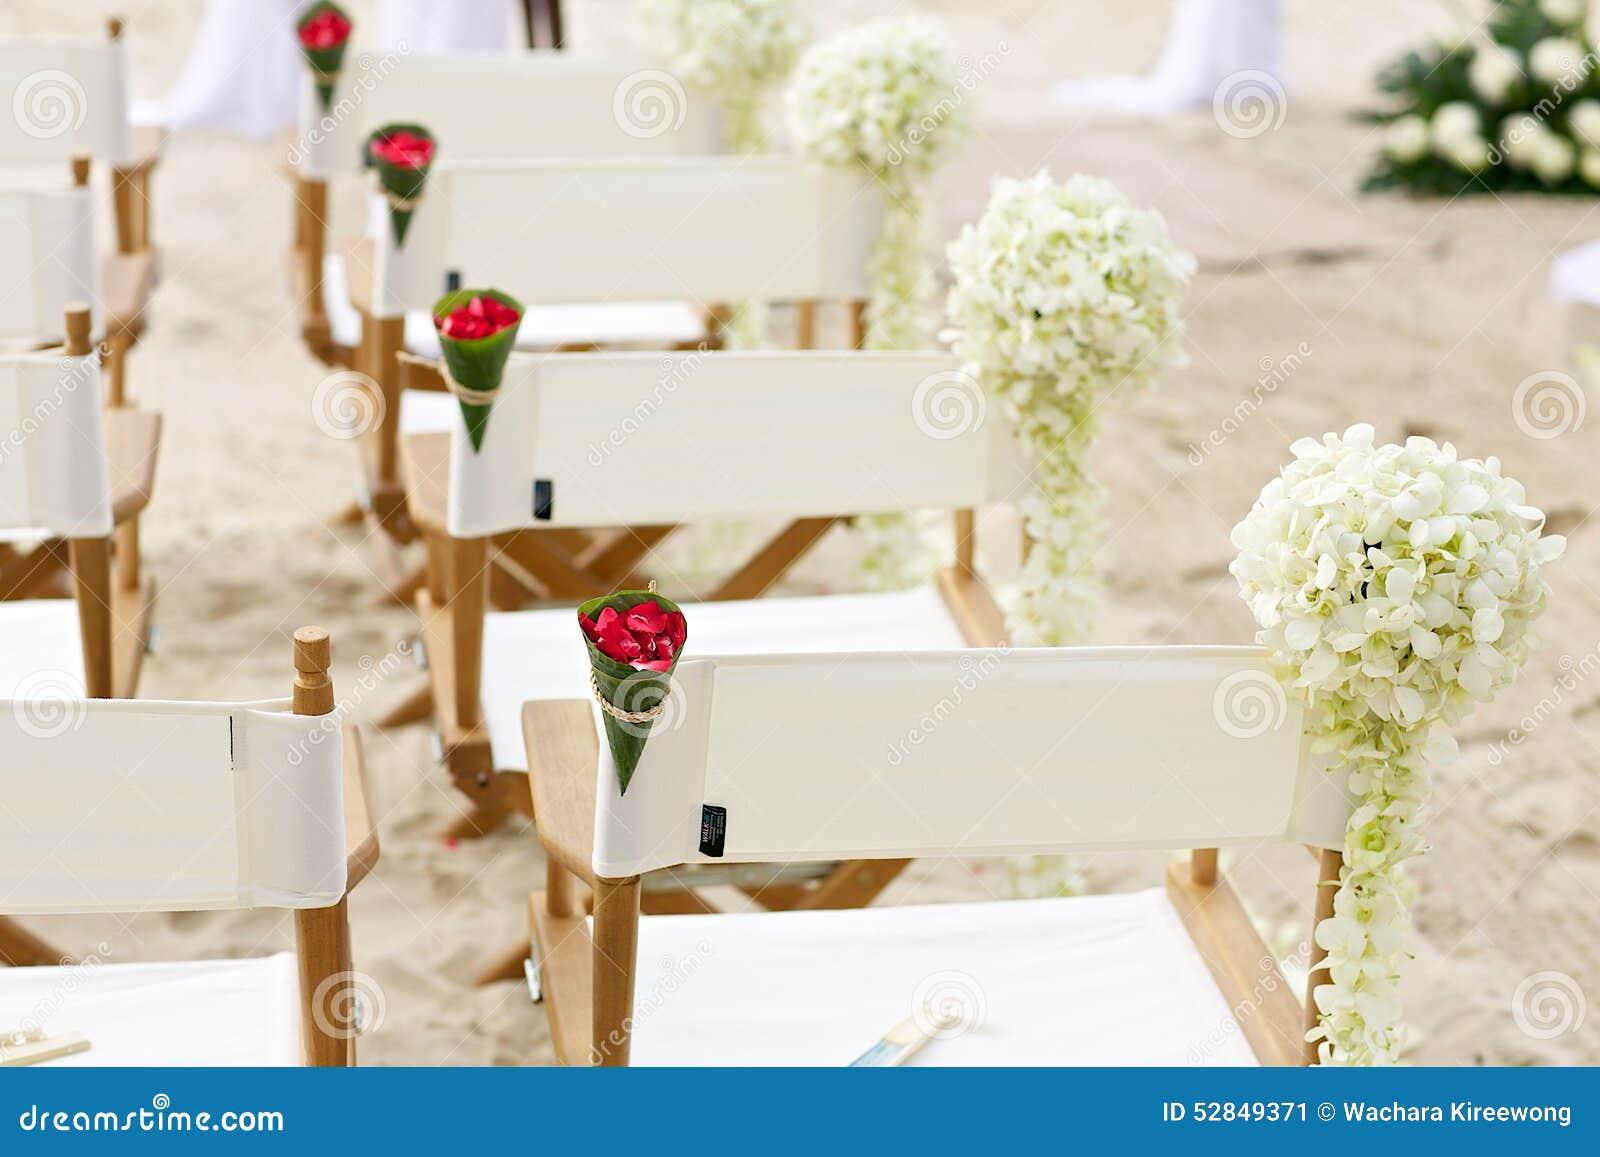 flower decoration chair on beach wedding venue stock image. Black Bedroom Furniture Sets. Home Design Ideas